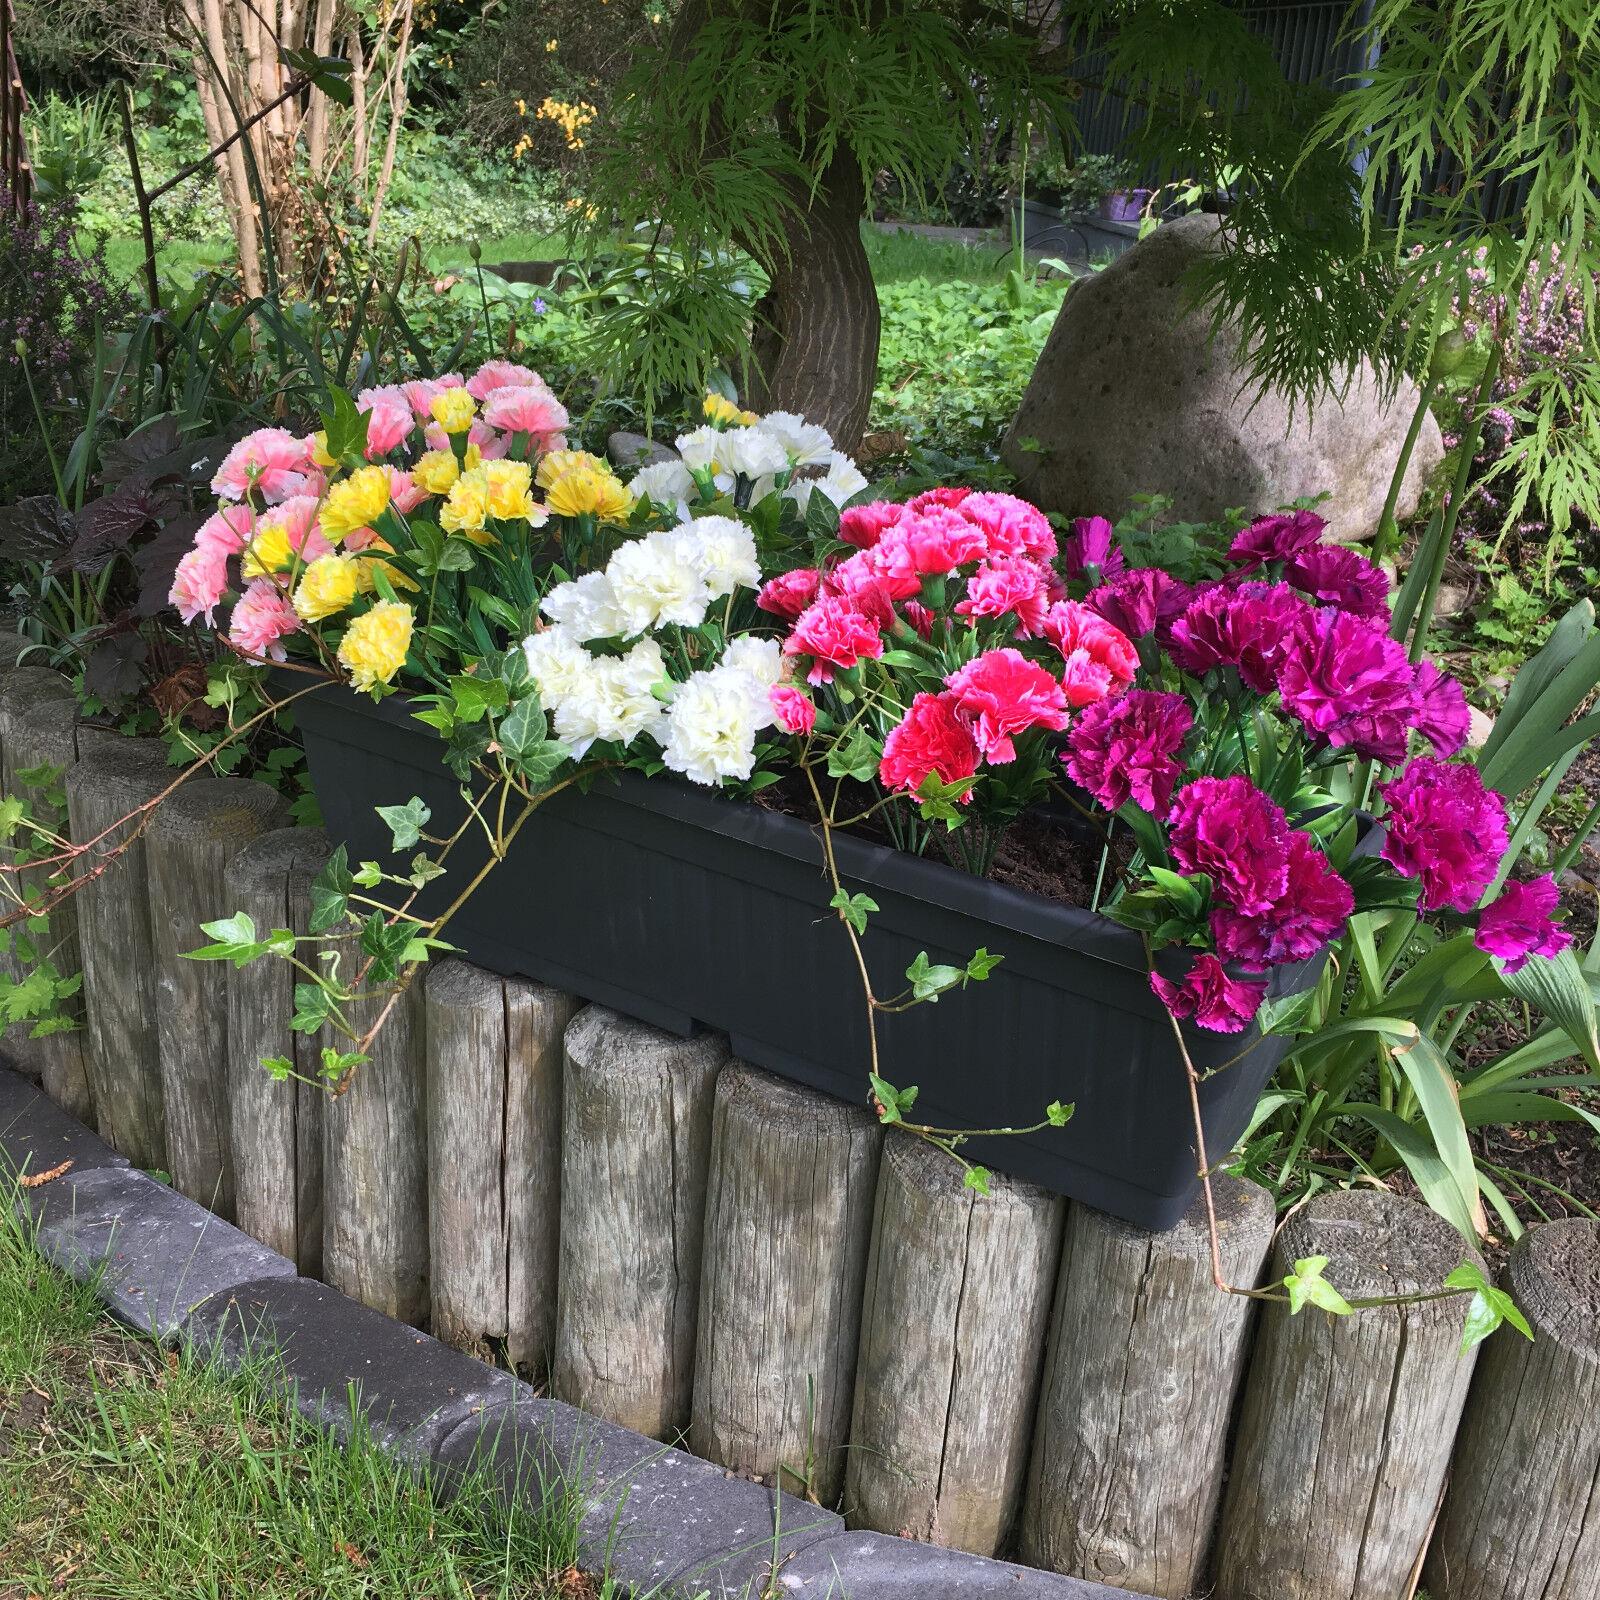 Balkonblumen Carnation Balkon Seidenblumen Kunstblumen Blumen Täuschend echt!